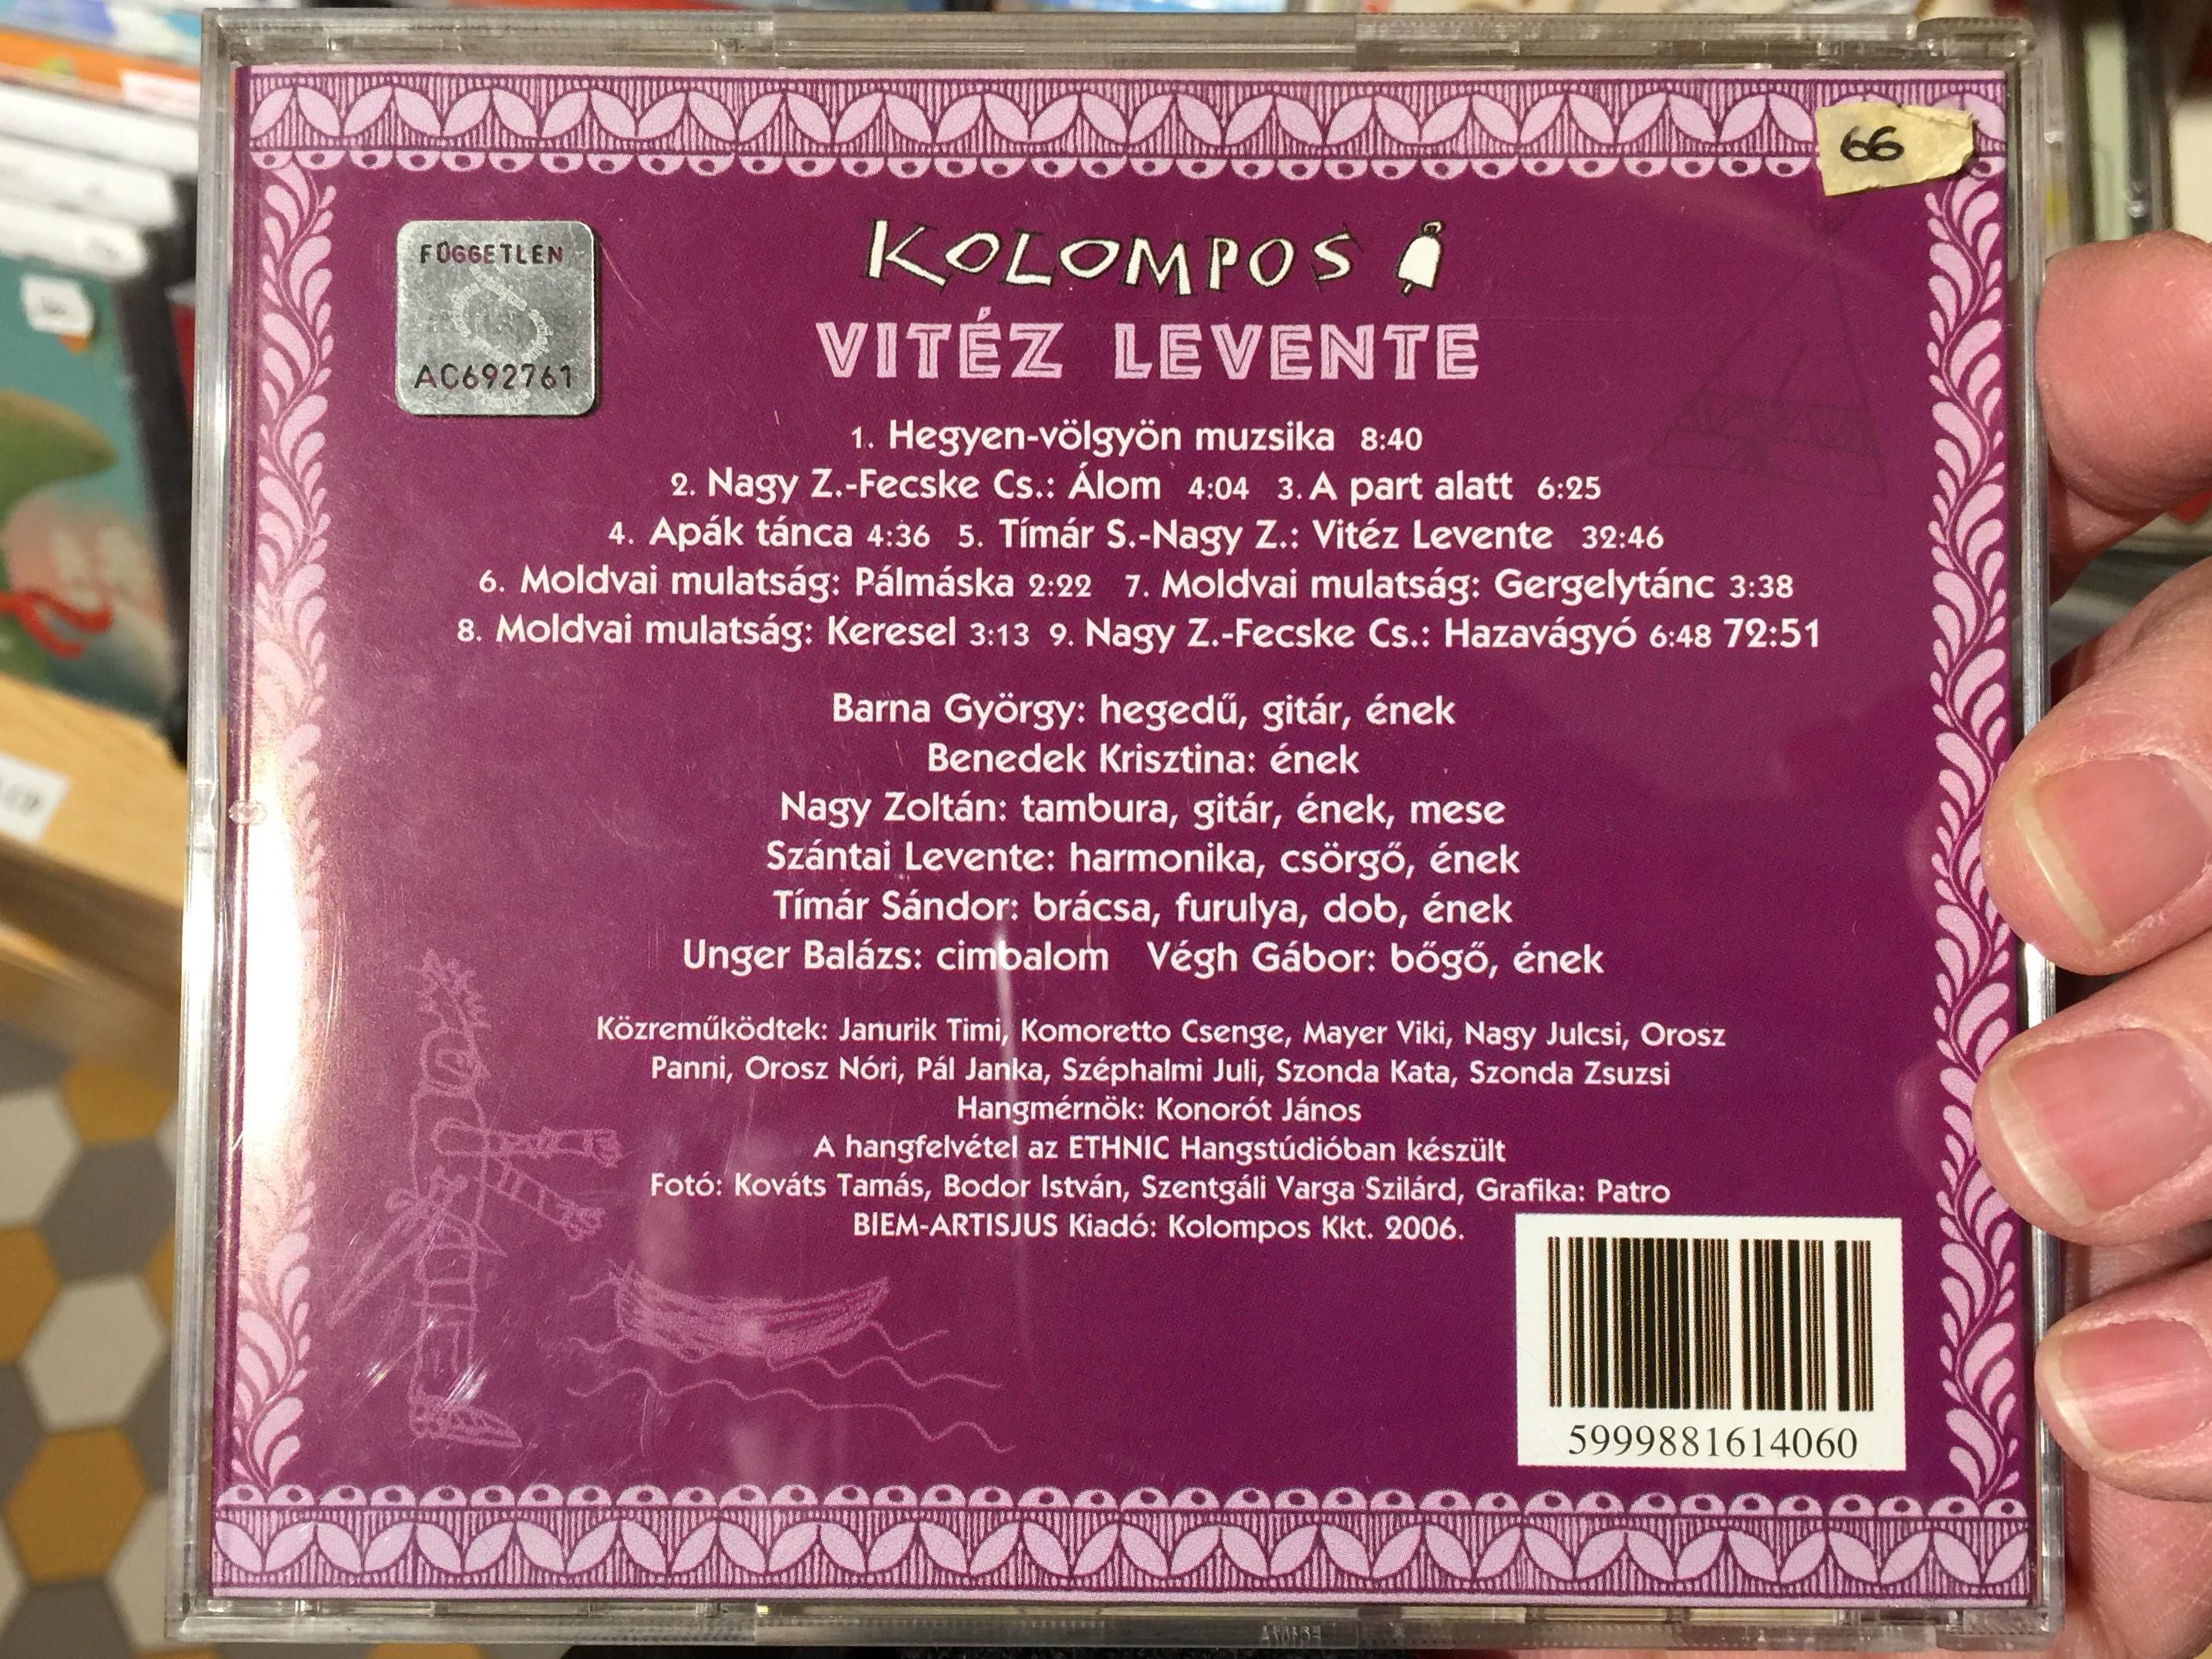 vit-z-levente-kolompos-mes-k-j-t-kok-nnepek-mulats-gok-kolompos-kkt.-audio-cd-2006-k-06-2-.jpg